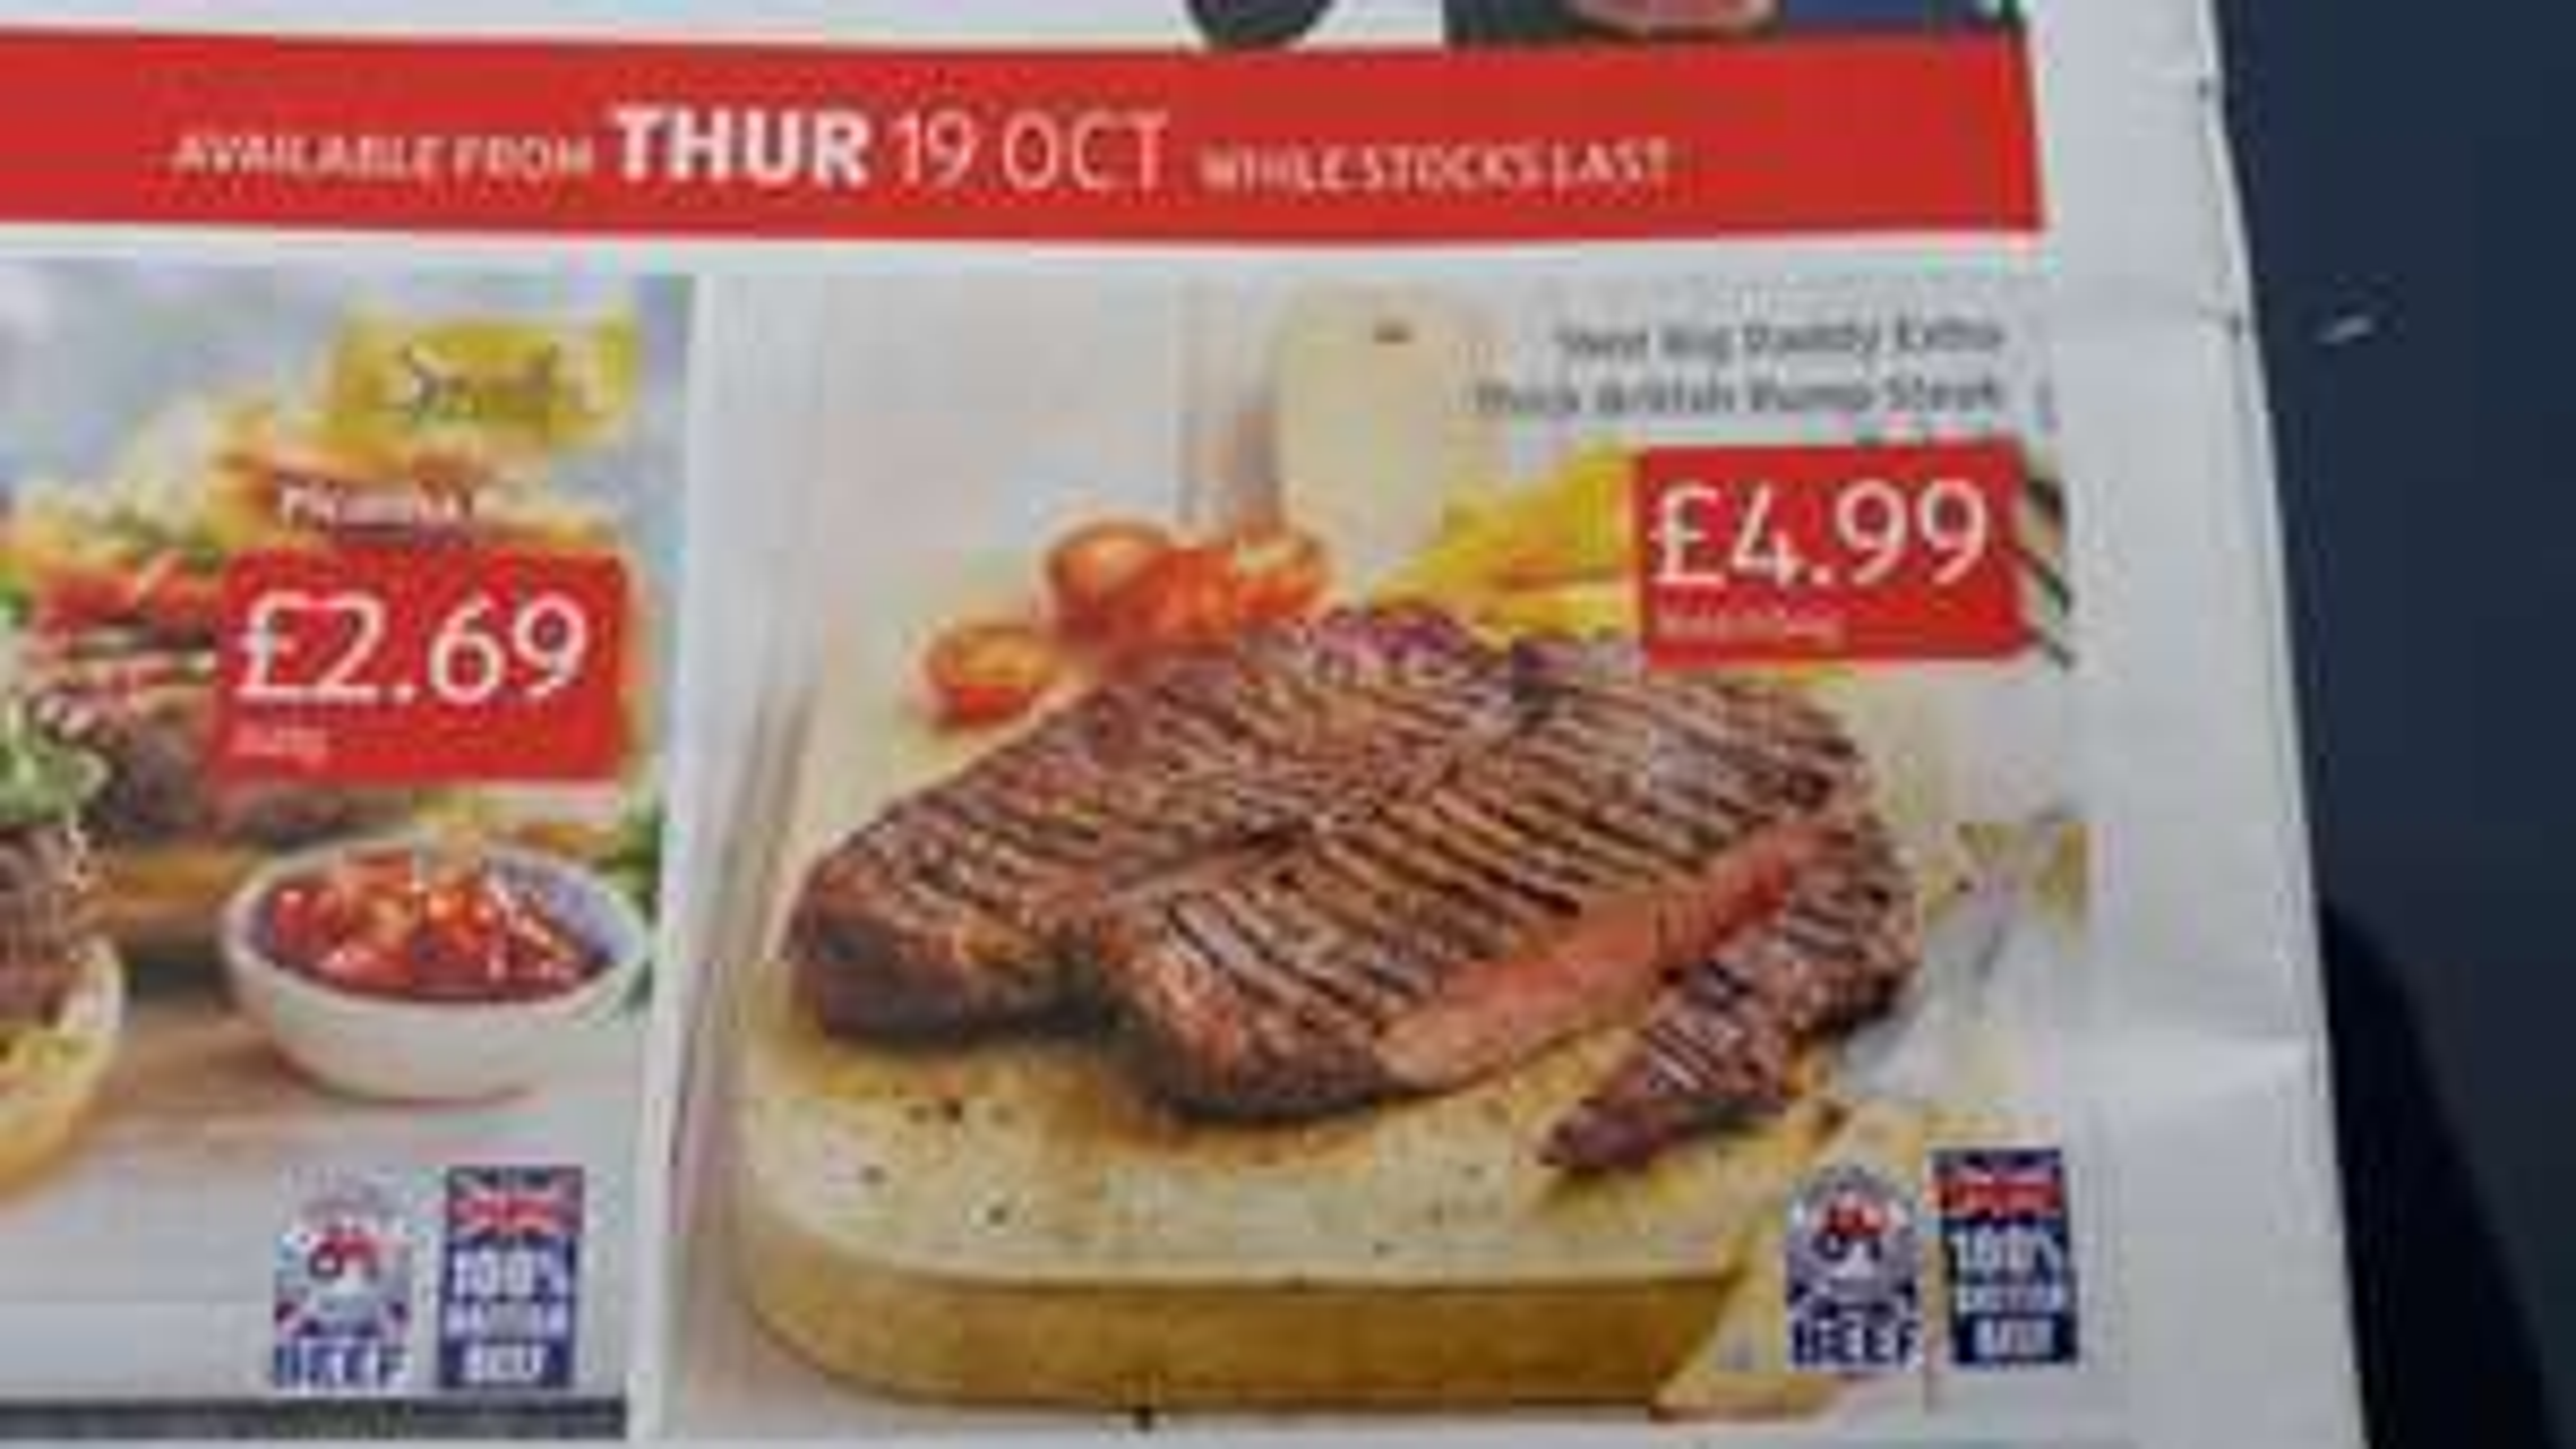 16oz Big Daddy Extra Thick British Rump Steak from Thursday 19th October @ Aldi